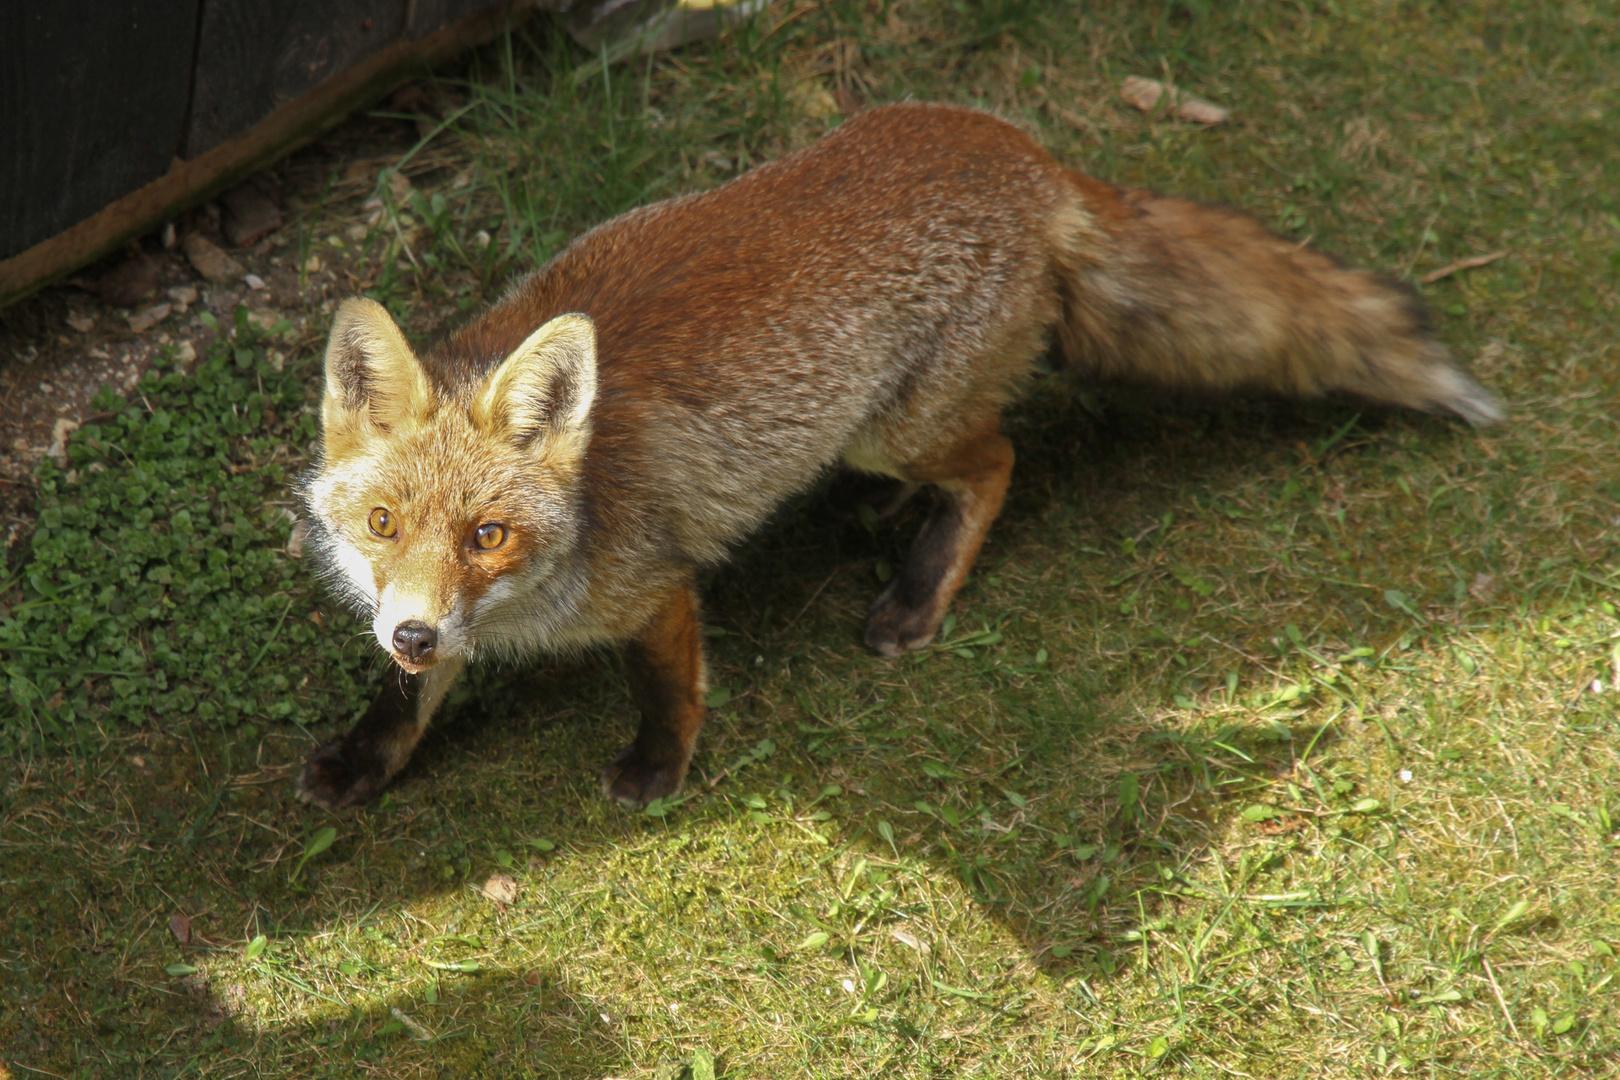 la volpe in giardino